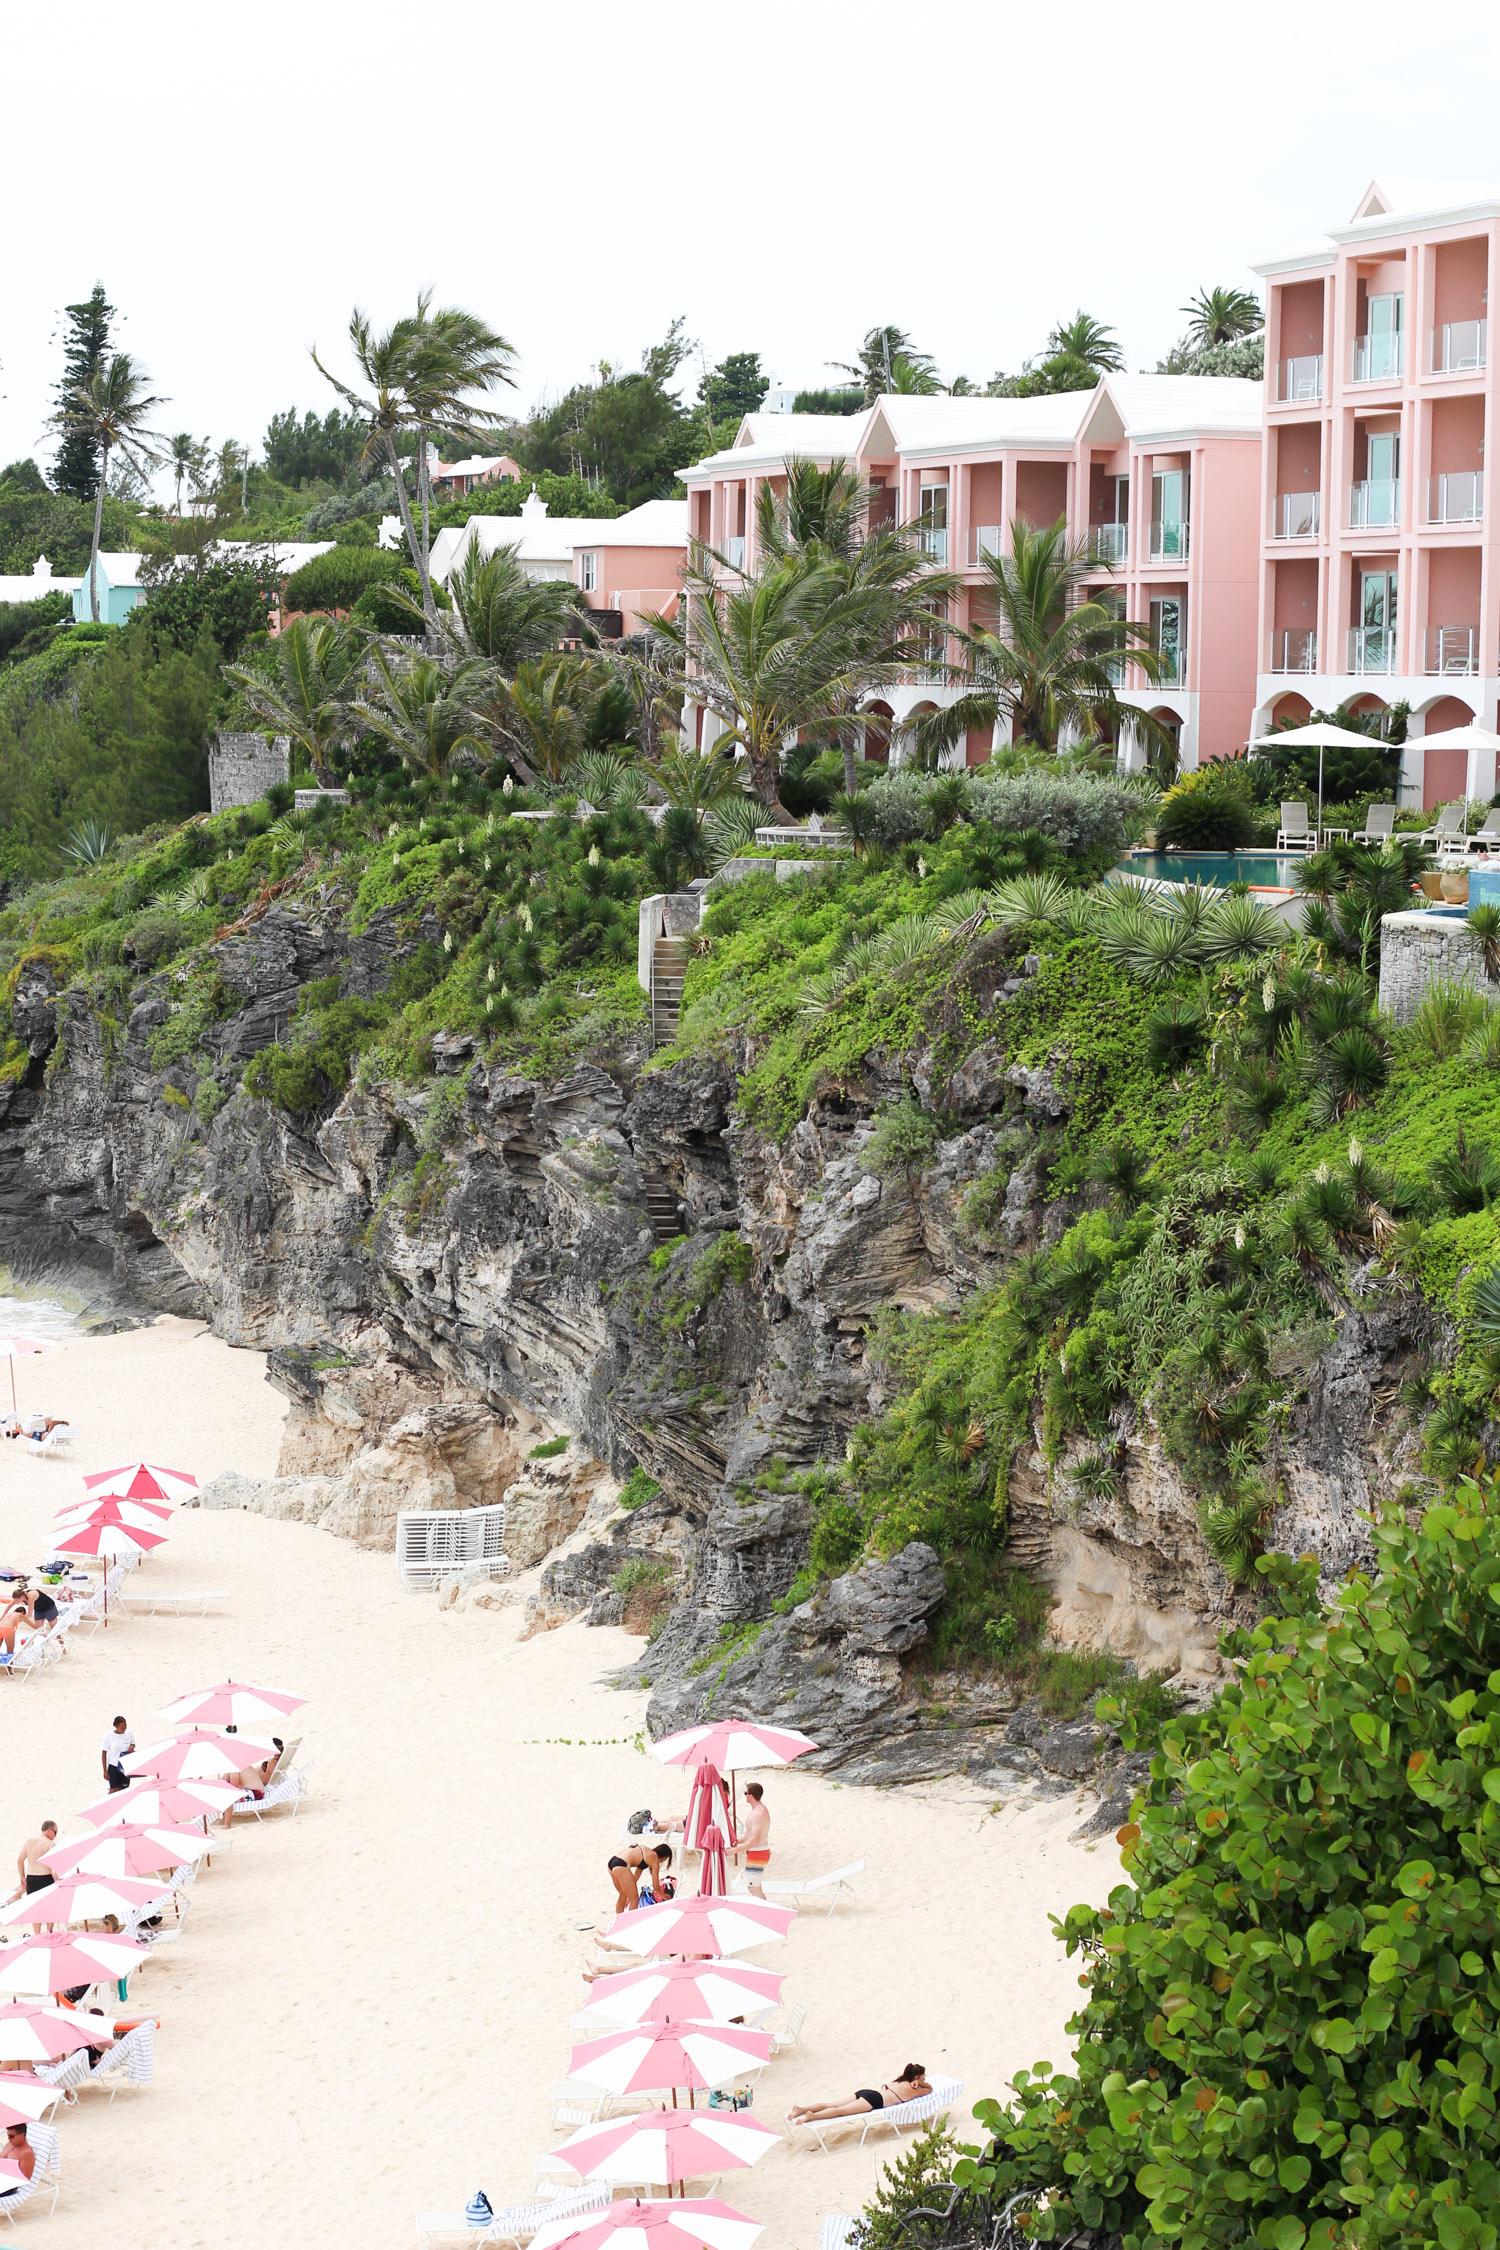 The Reefs, Bermuda | Bermuda travel guide featured by popular DC travel blogger, Monica Dutia